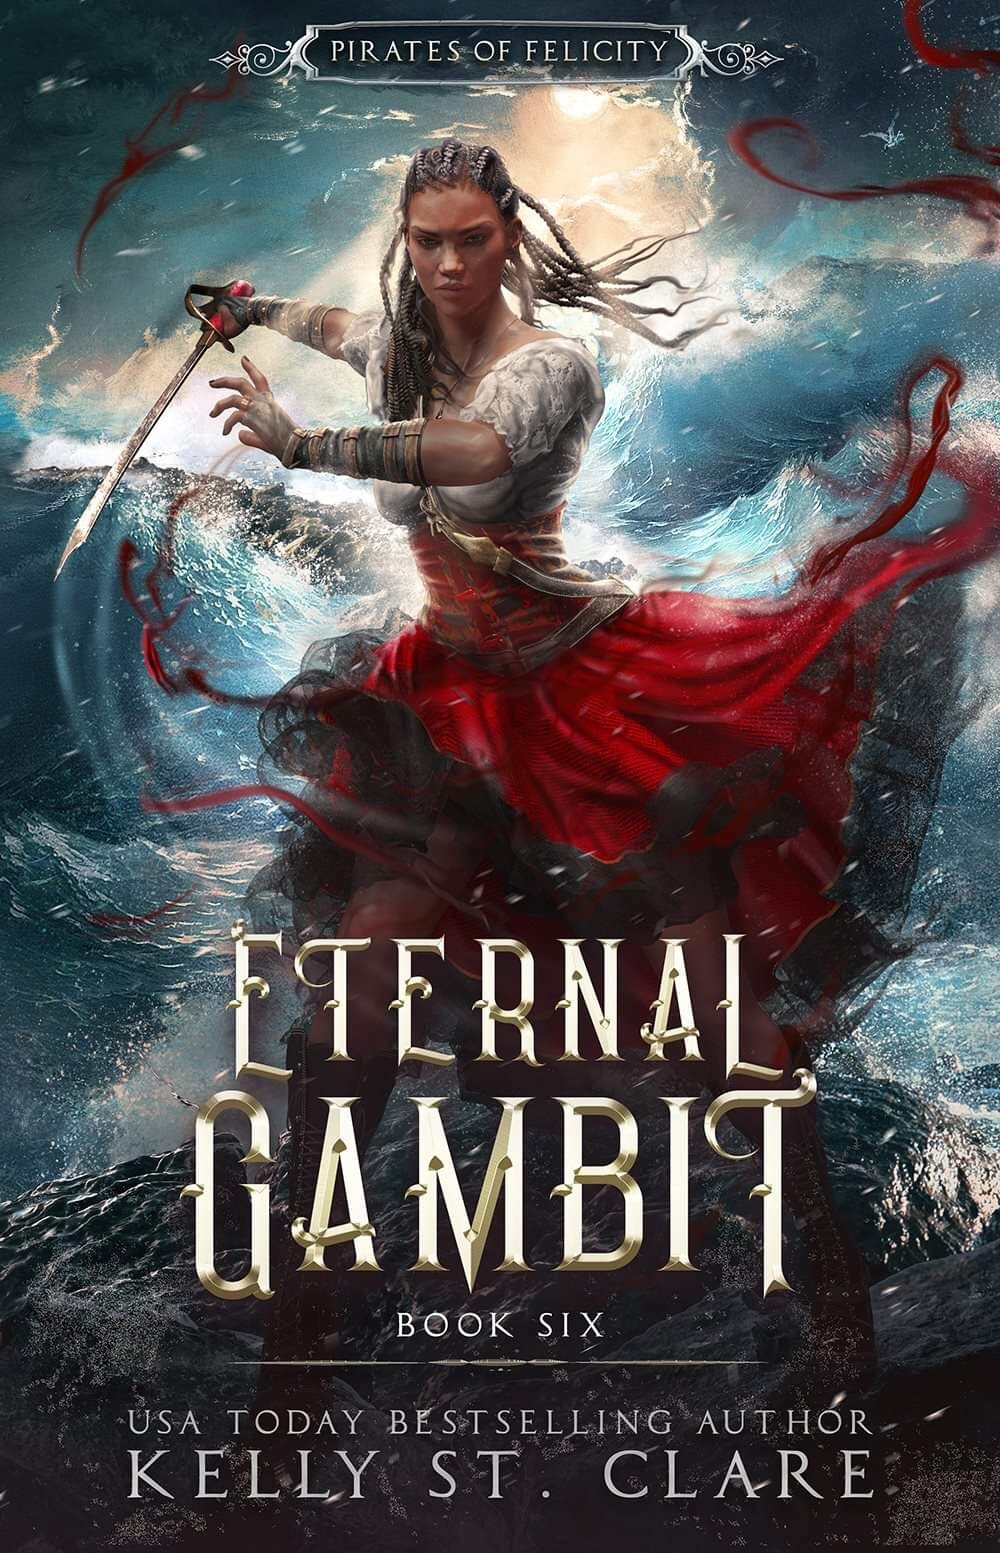 Kelly St. Clare - Pirates of Felicity 6 - Ebba-Viva Fairisles Eternal Gambit